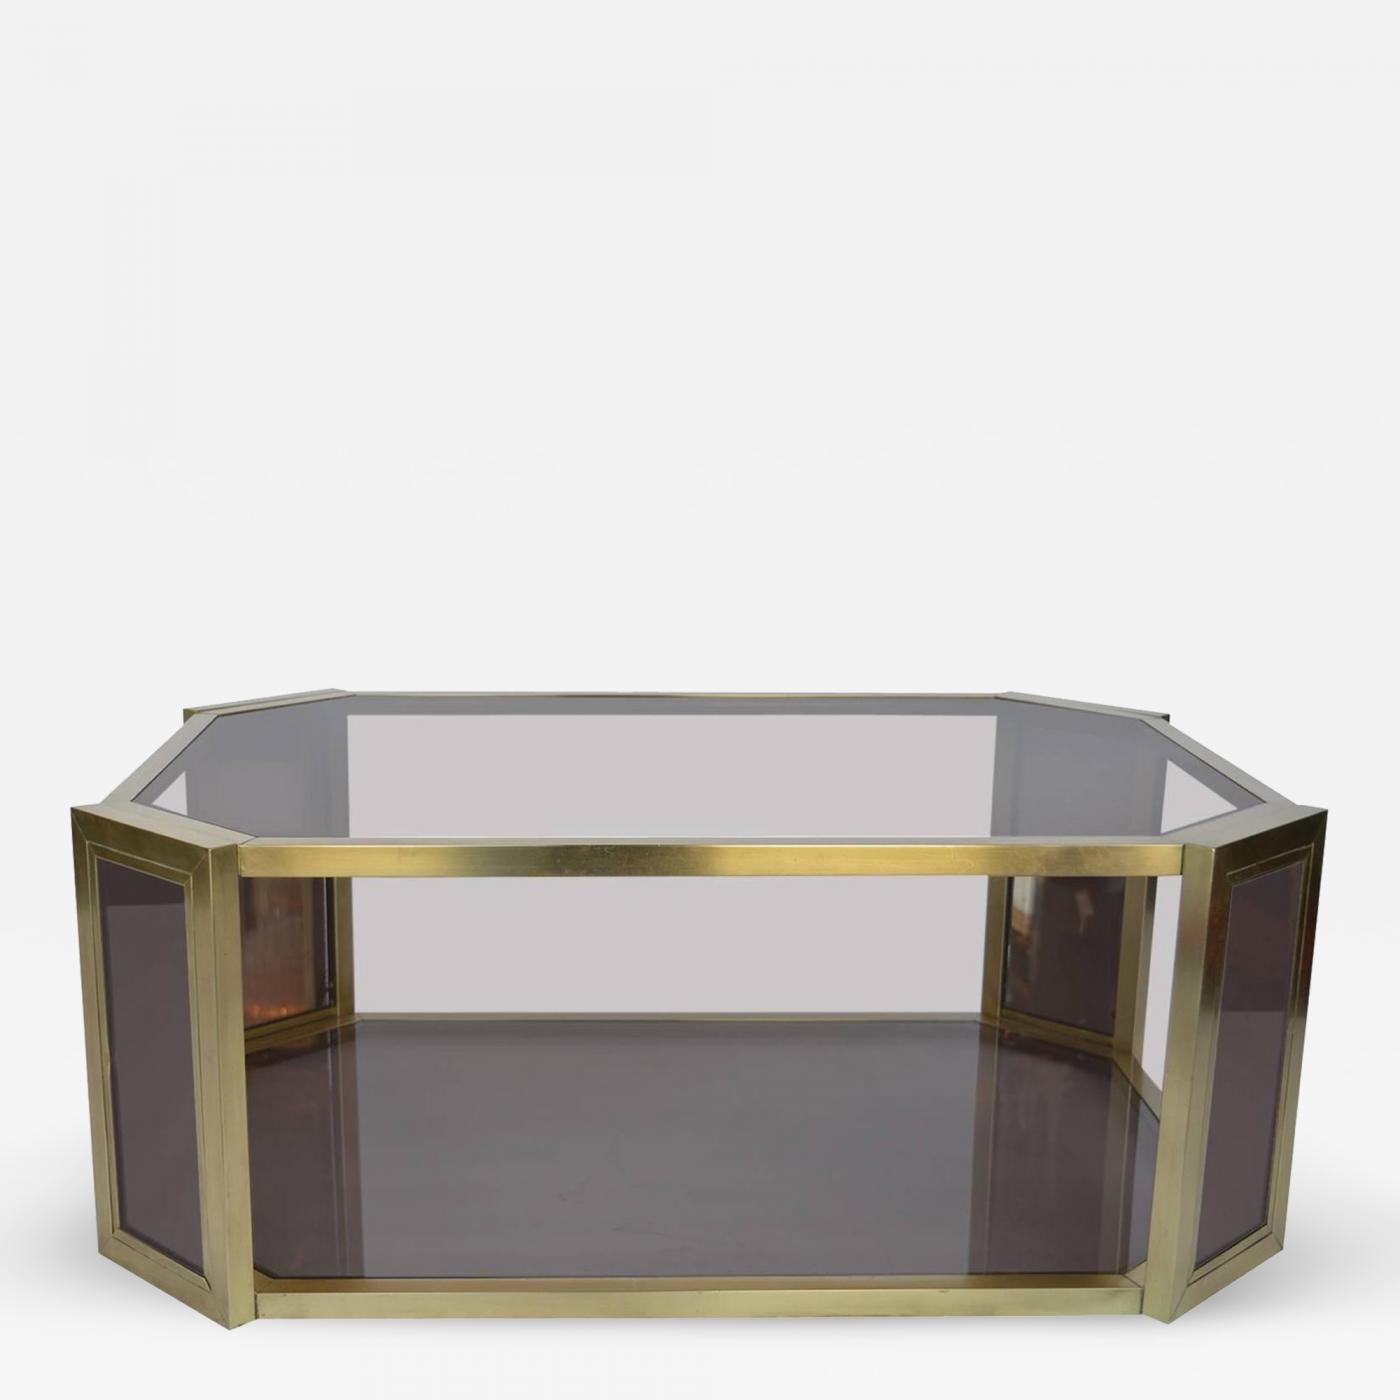 Genial Listings / Furniture / Tables / Center Tables · Karl Springer Brass  Mirrored Karl Springer Coffee Table